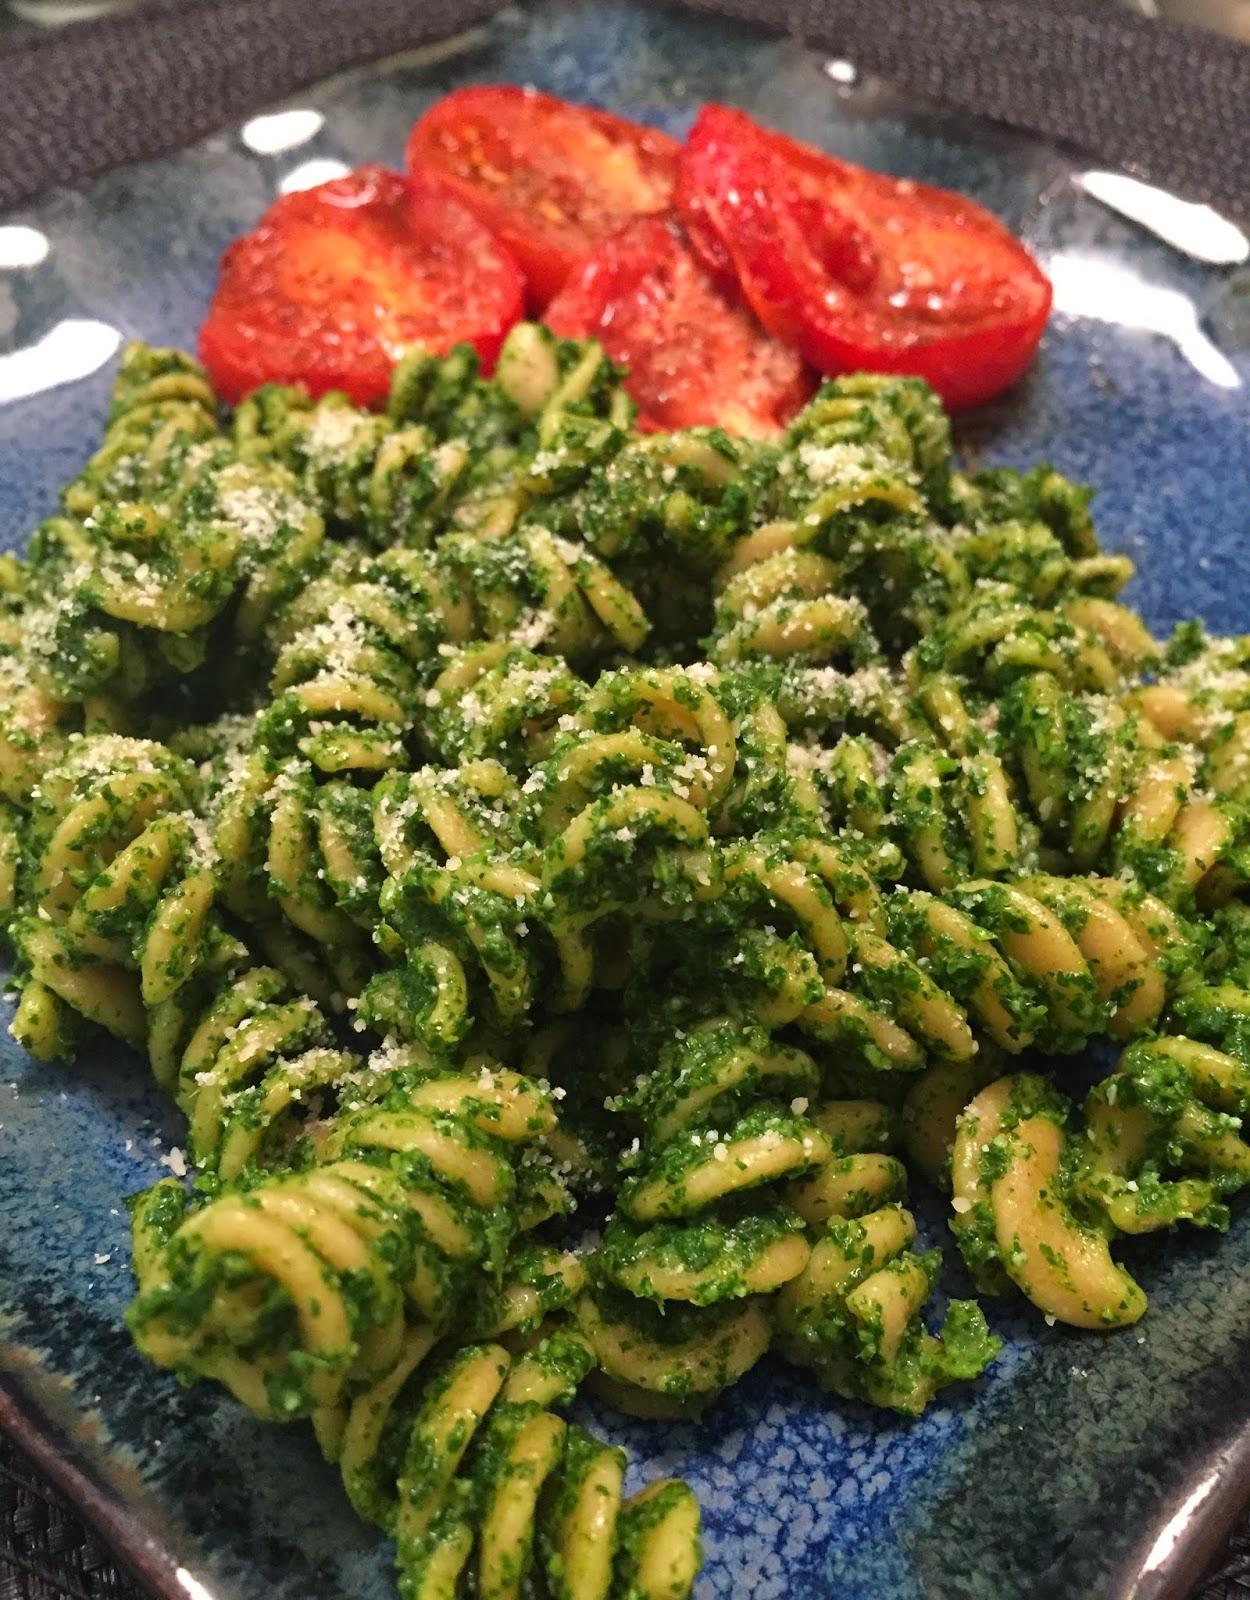 Rigatoni with Kale Pesto & Balsamic Tomatoes